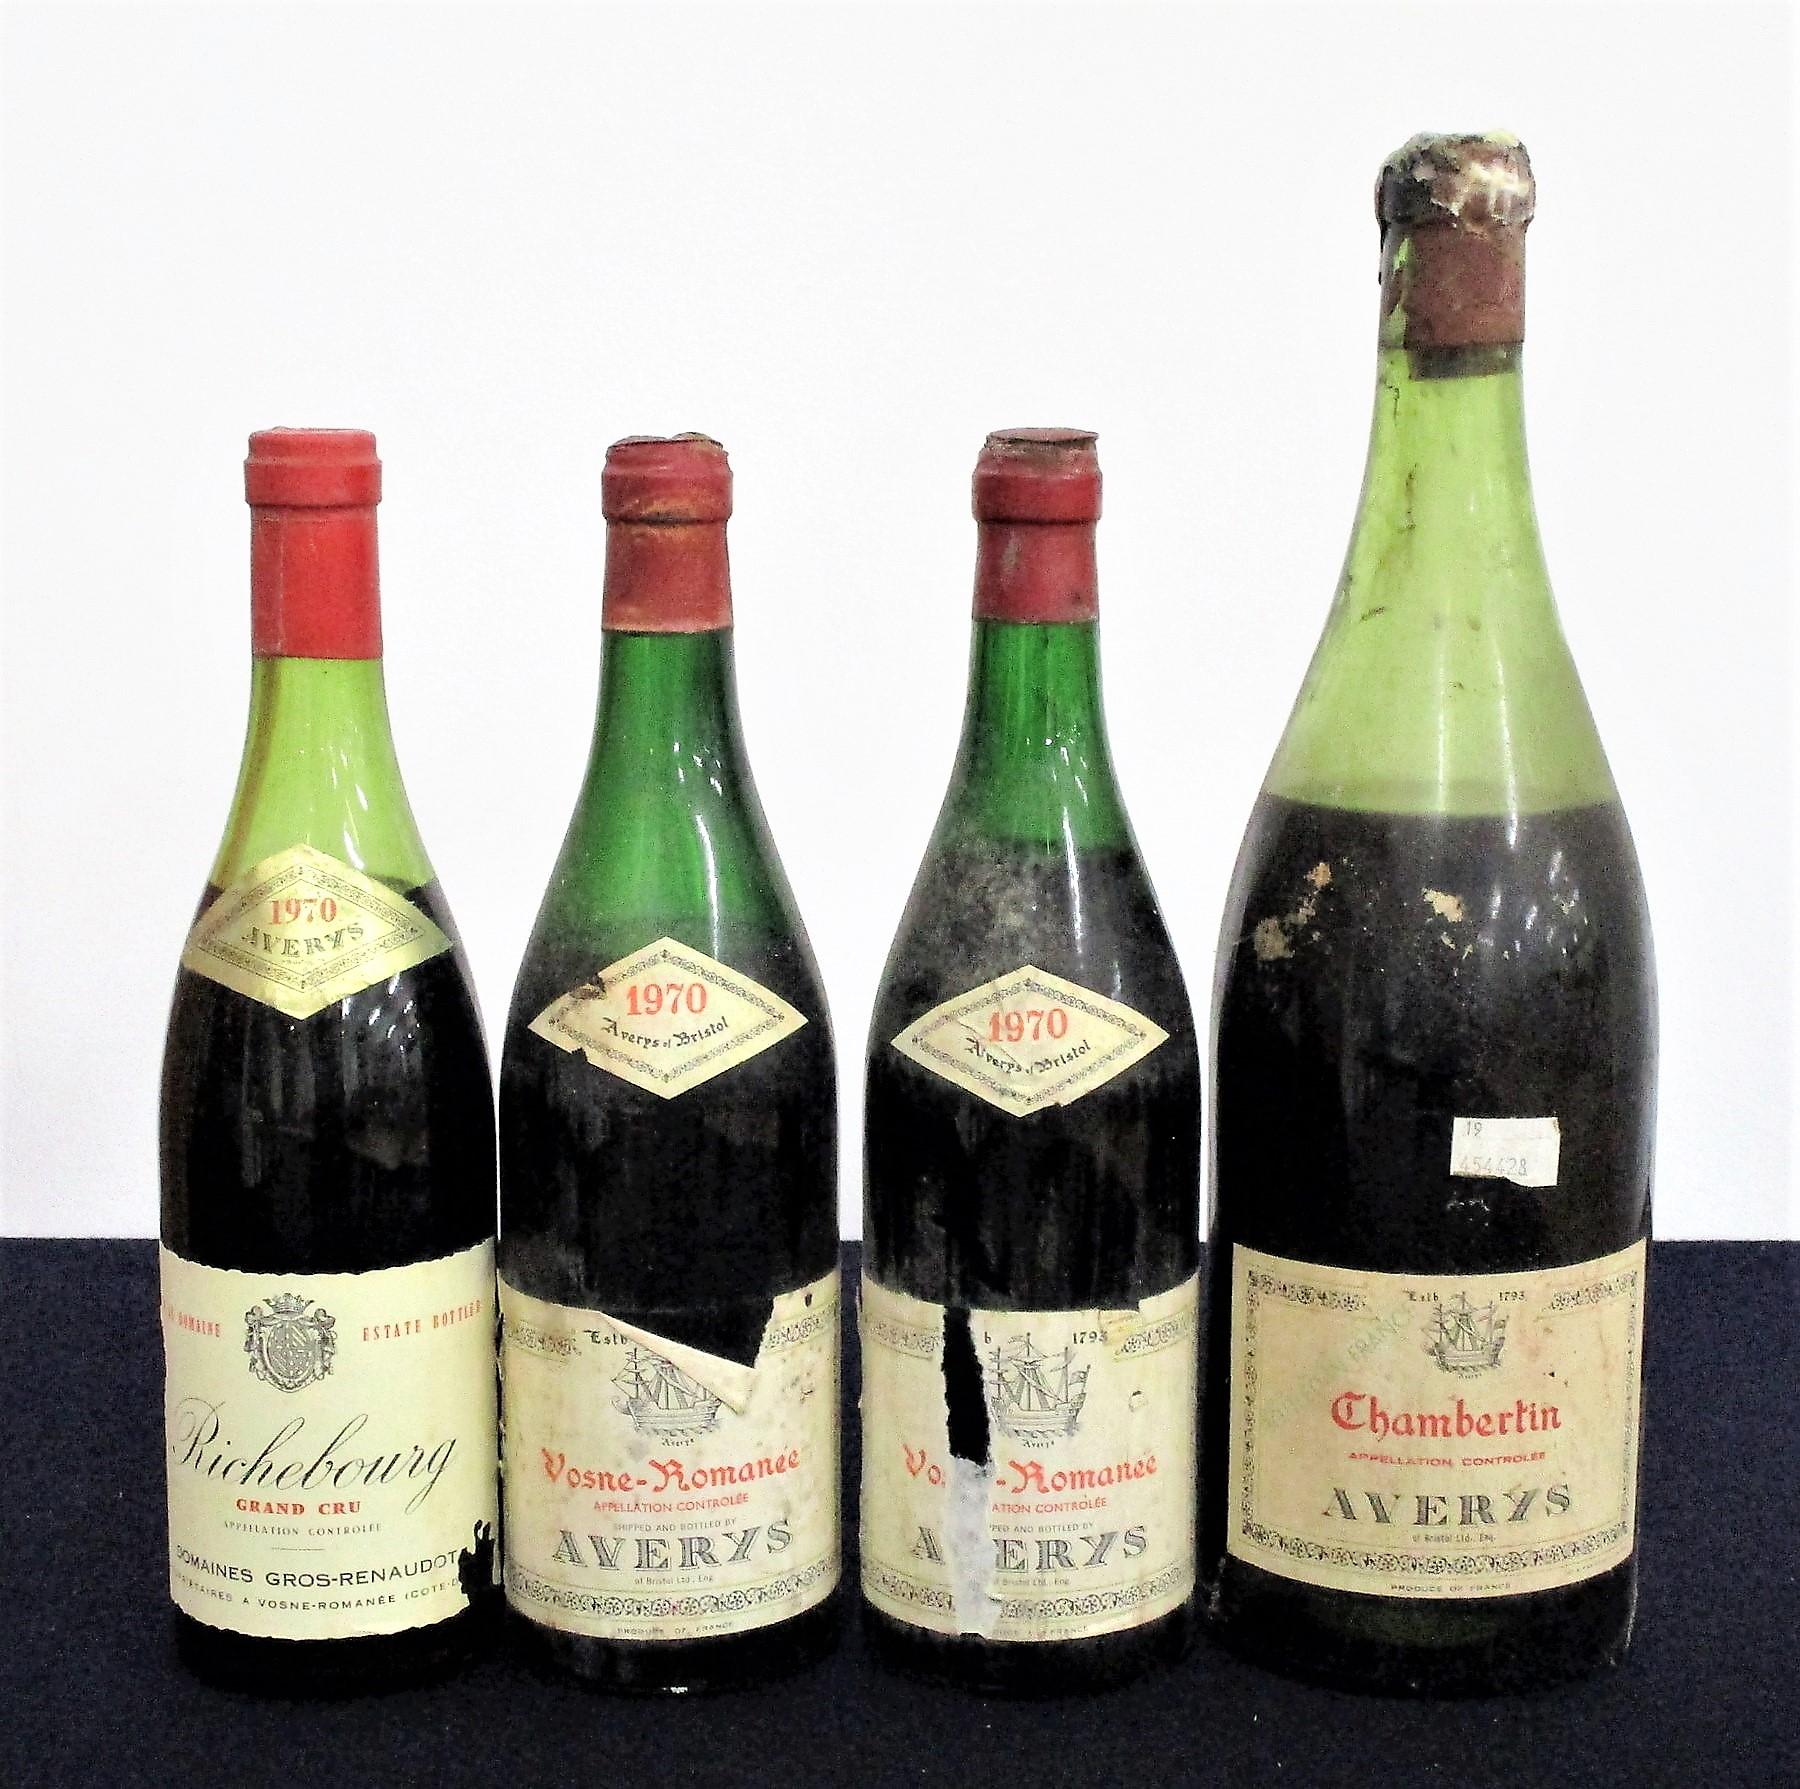 1 bt Richebourg Grand Cru 1970 Dom Gros-Renaudot 1970 Estate bottled, ls, sl crusted foil, sl